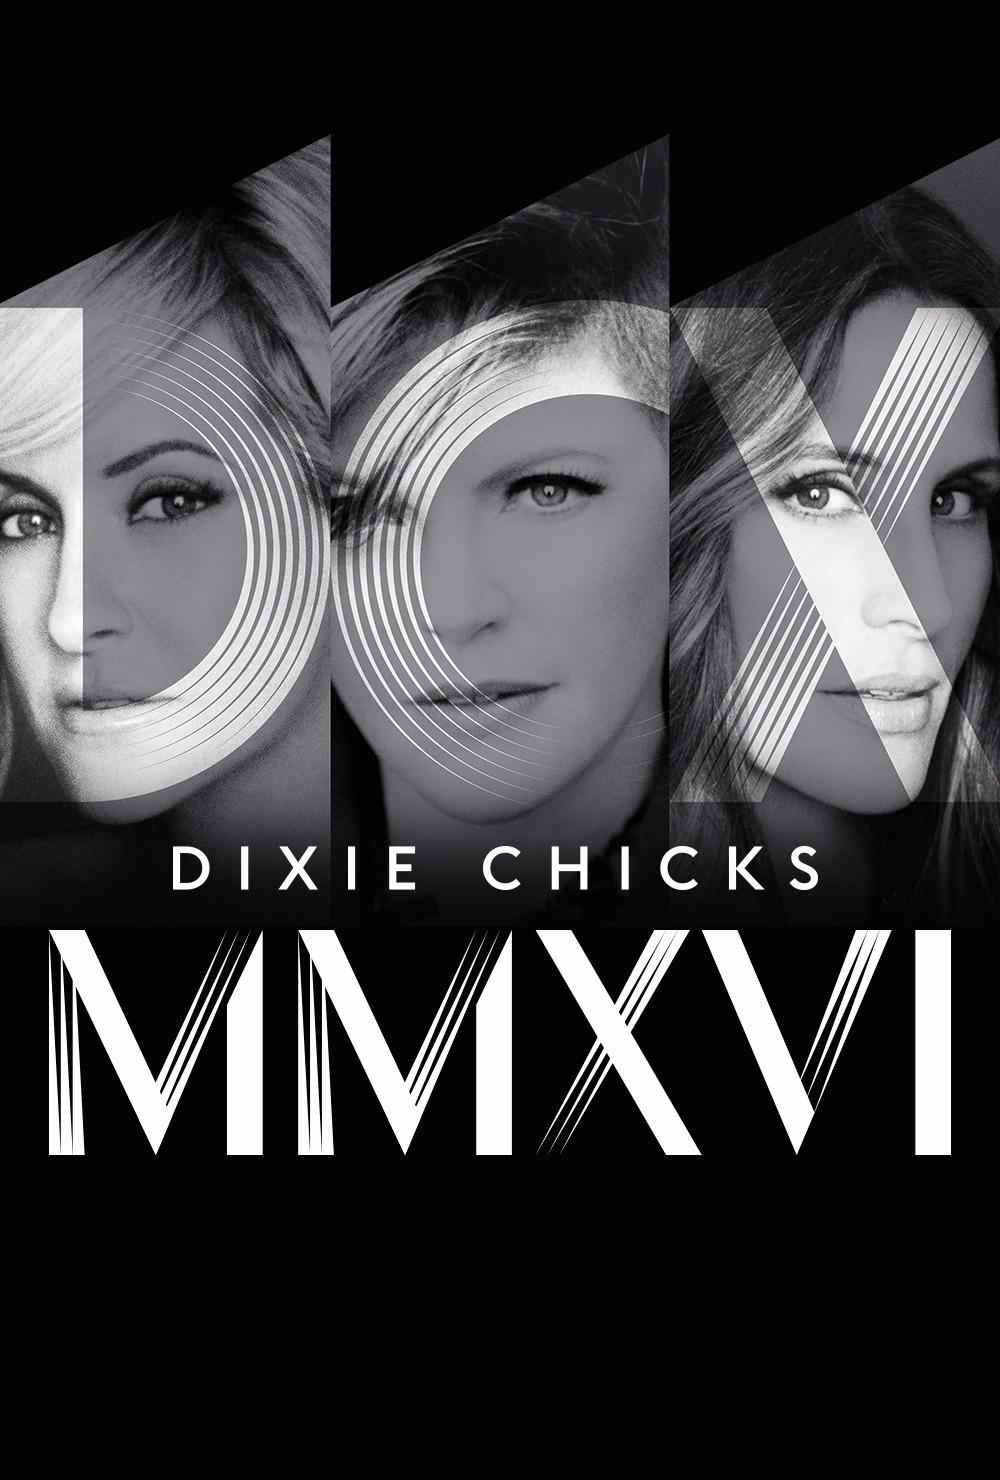 DCX MMXVI - In Concert